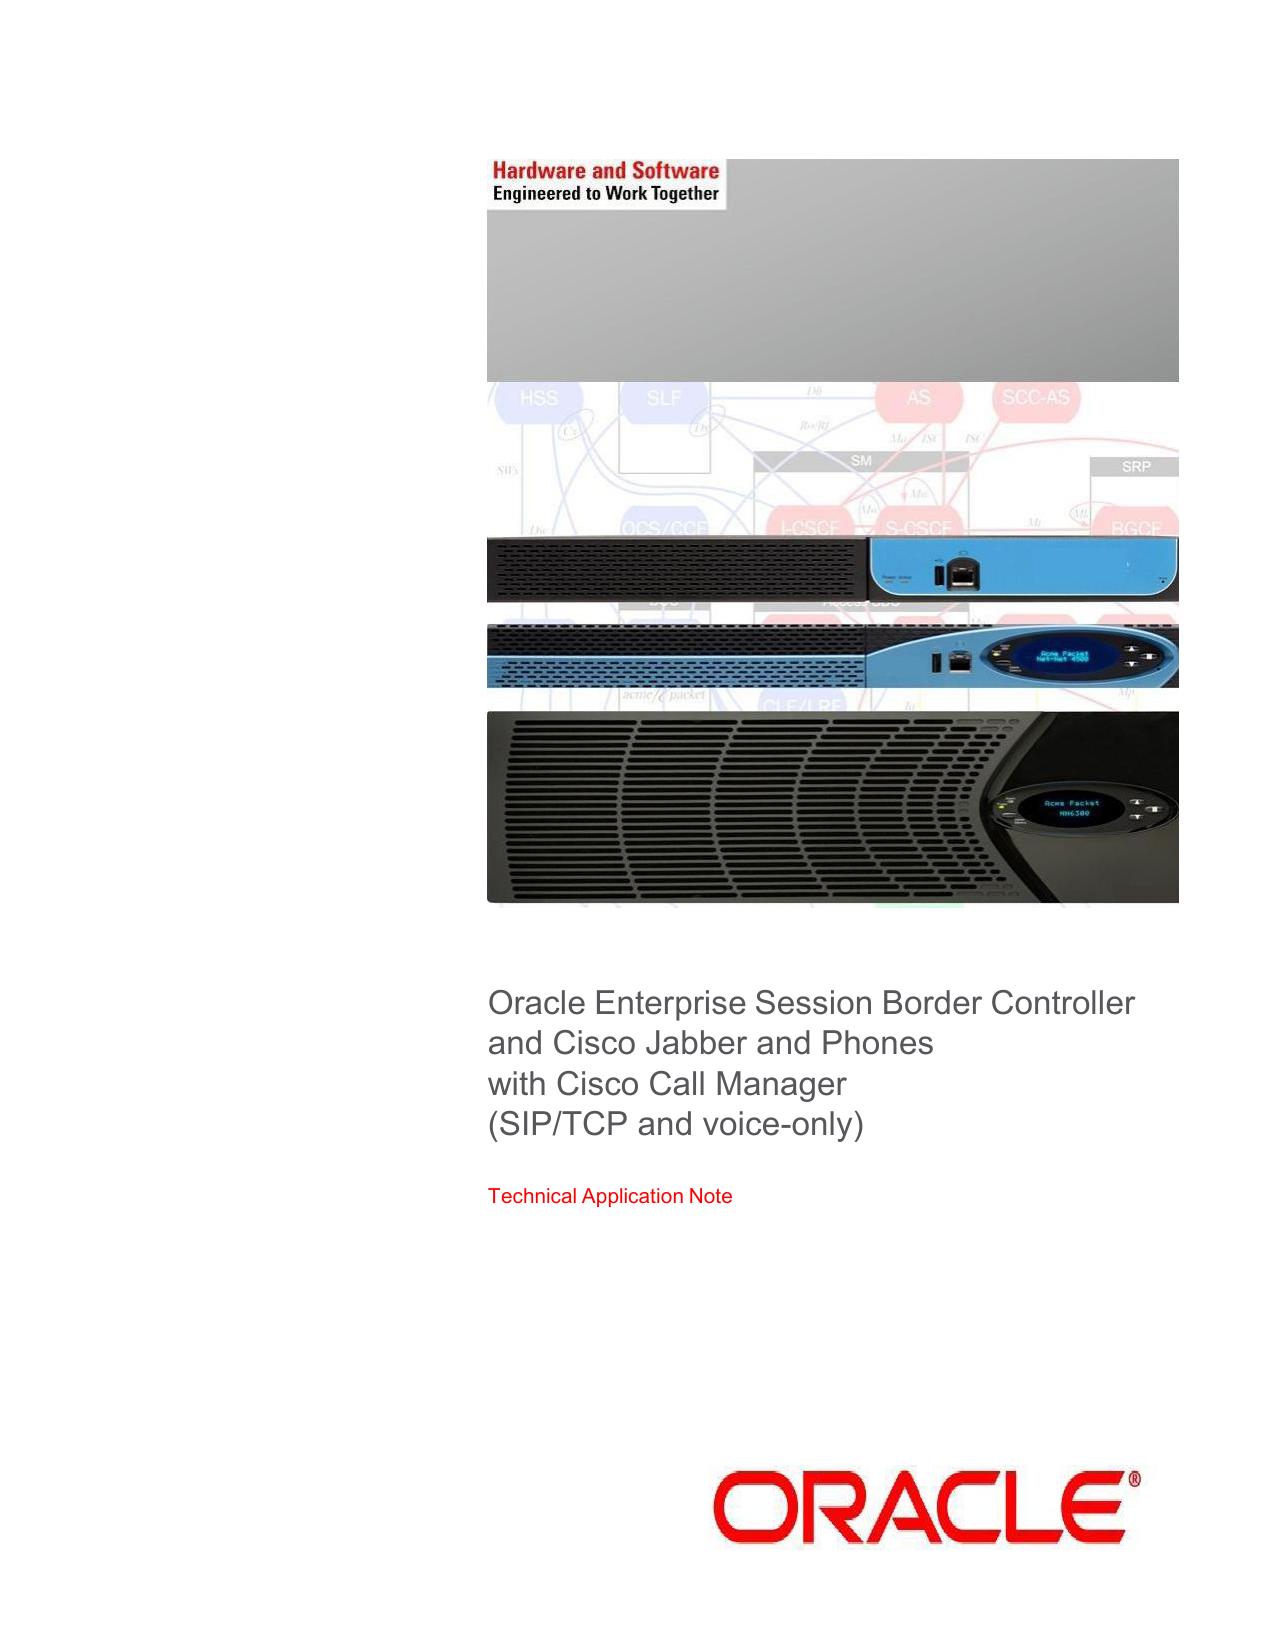 Oracle Enterprise Session Border Controller and Cisco Jabber